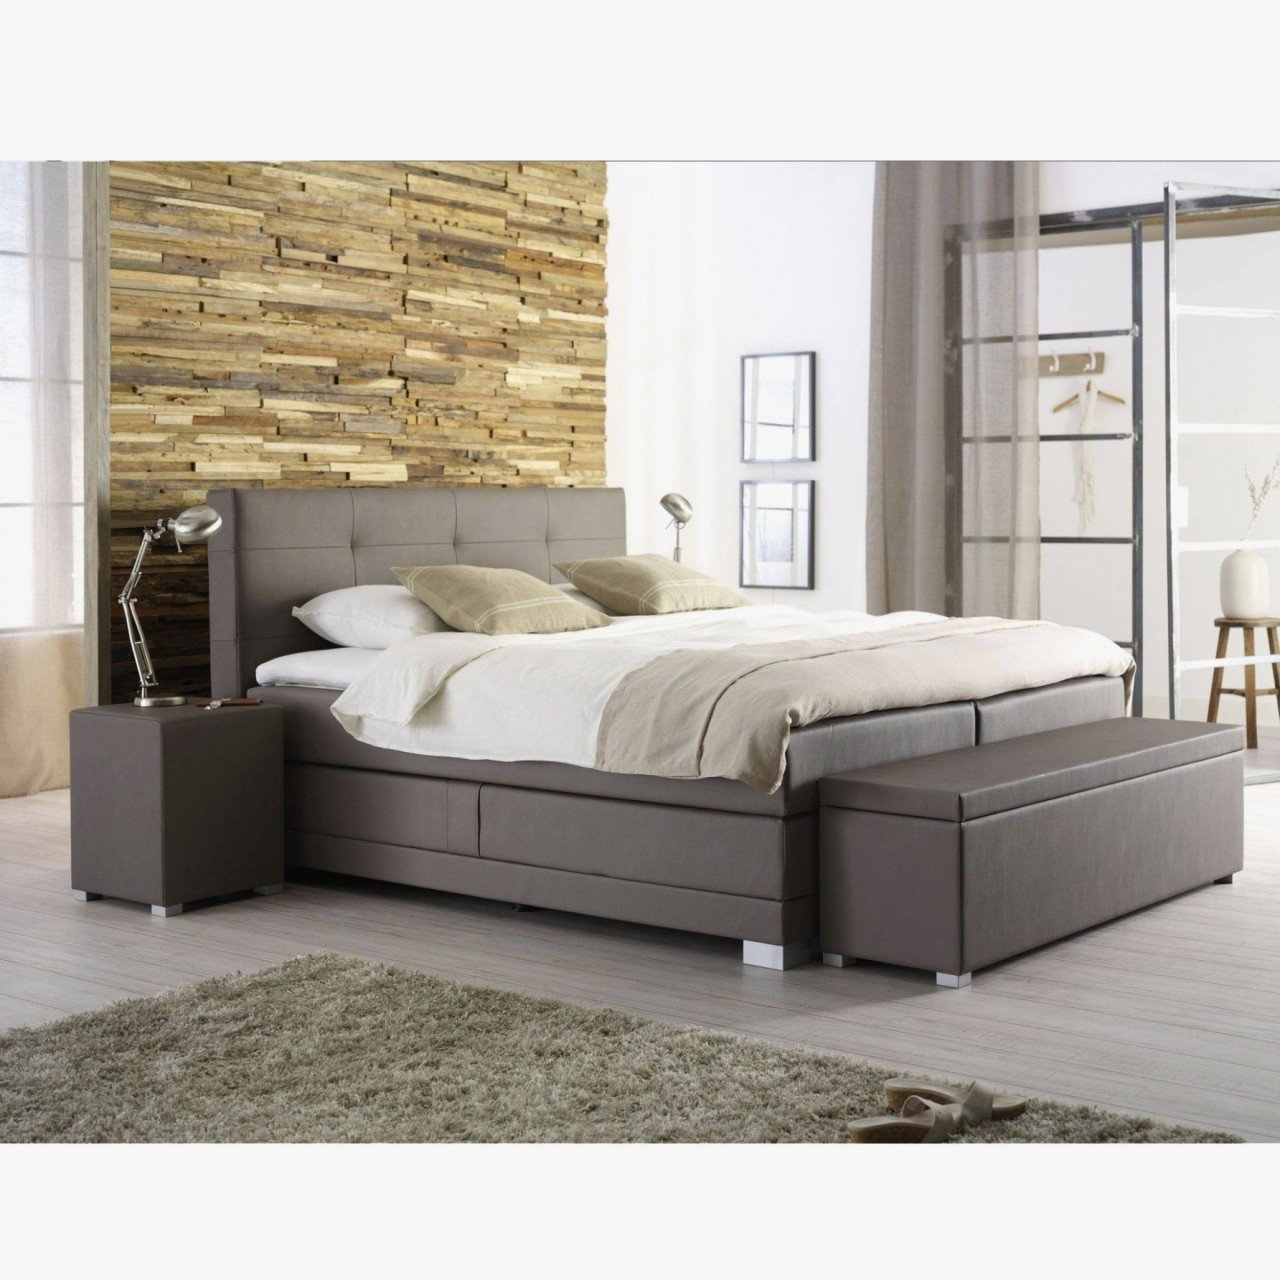 Queen Size Bedroom Set New Drawers Under Bed — Procura Home Blog